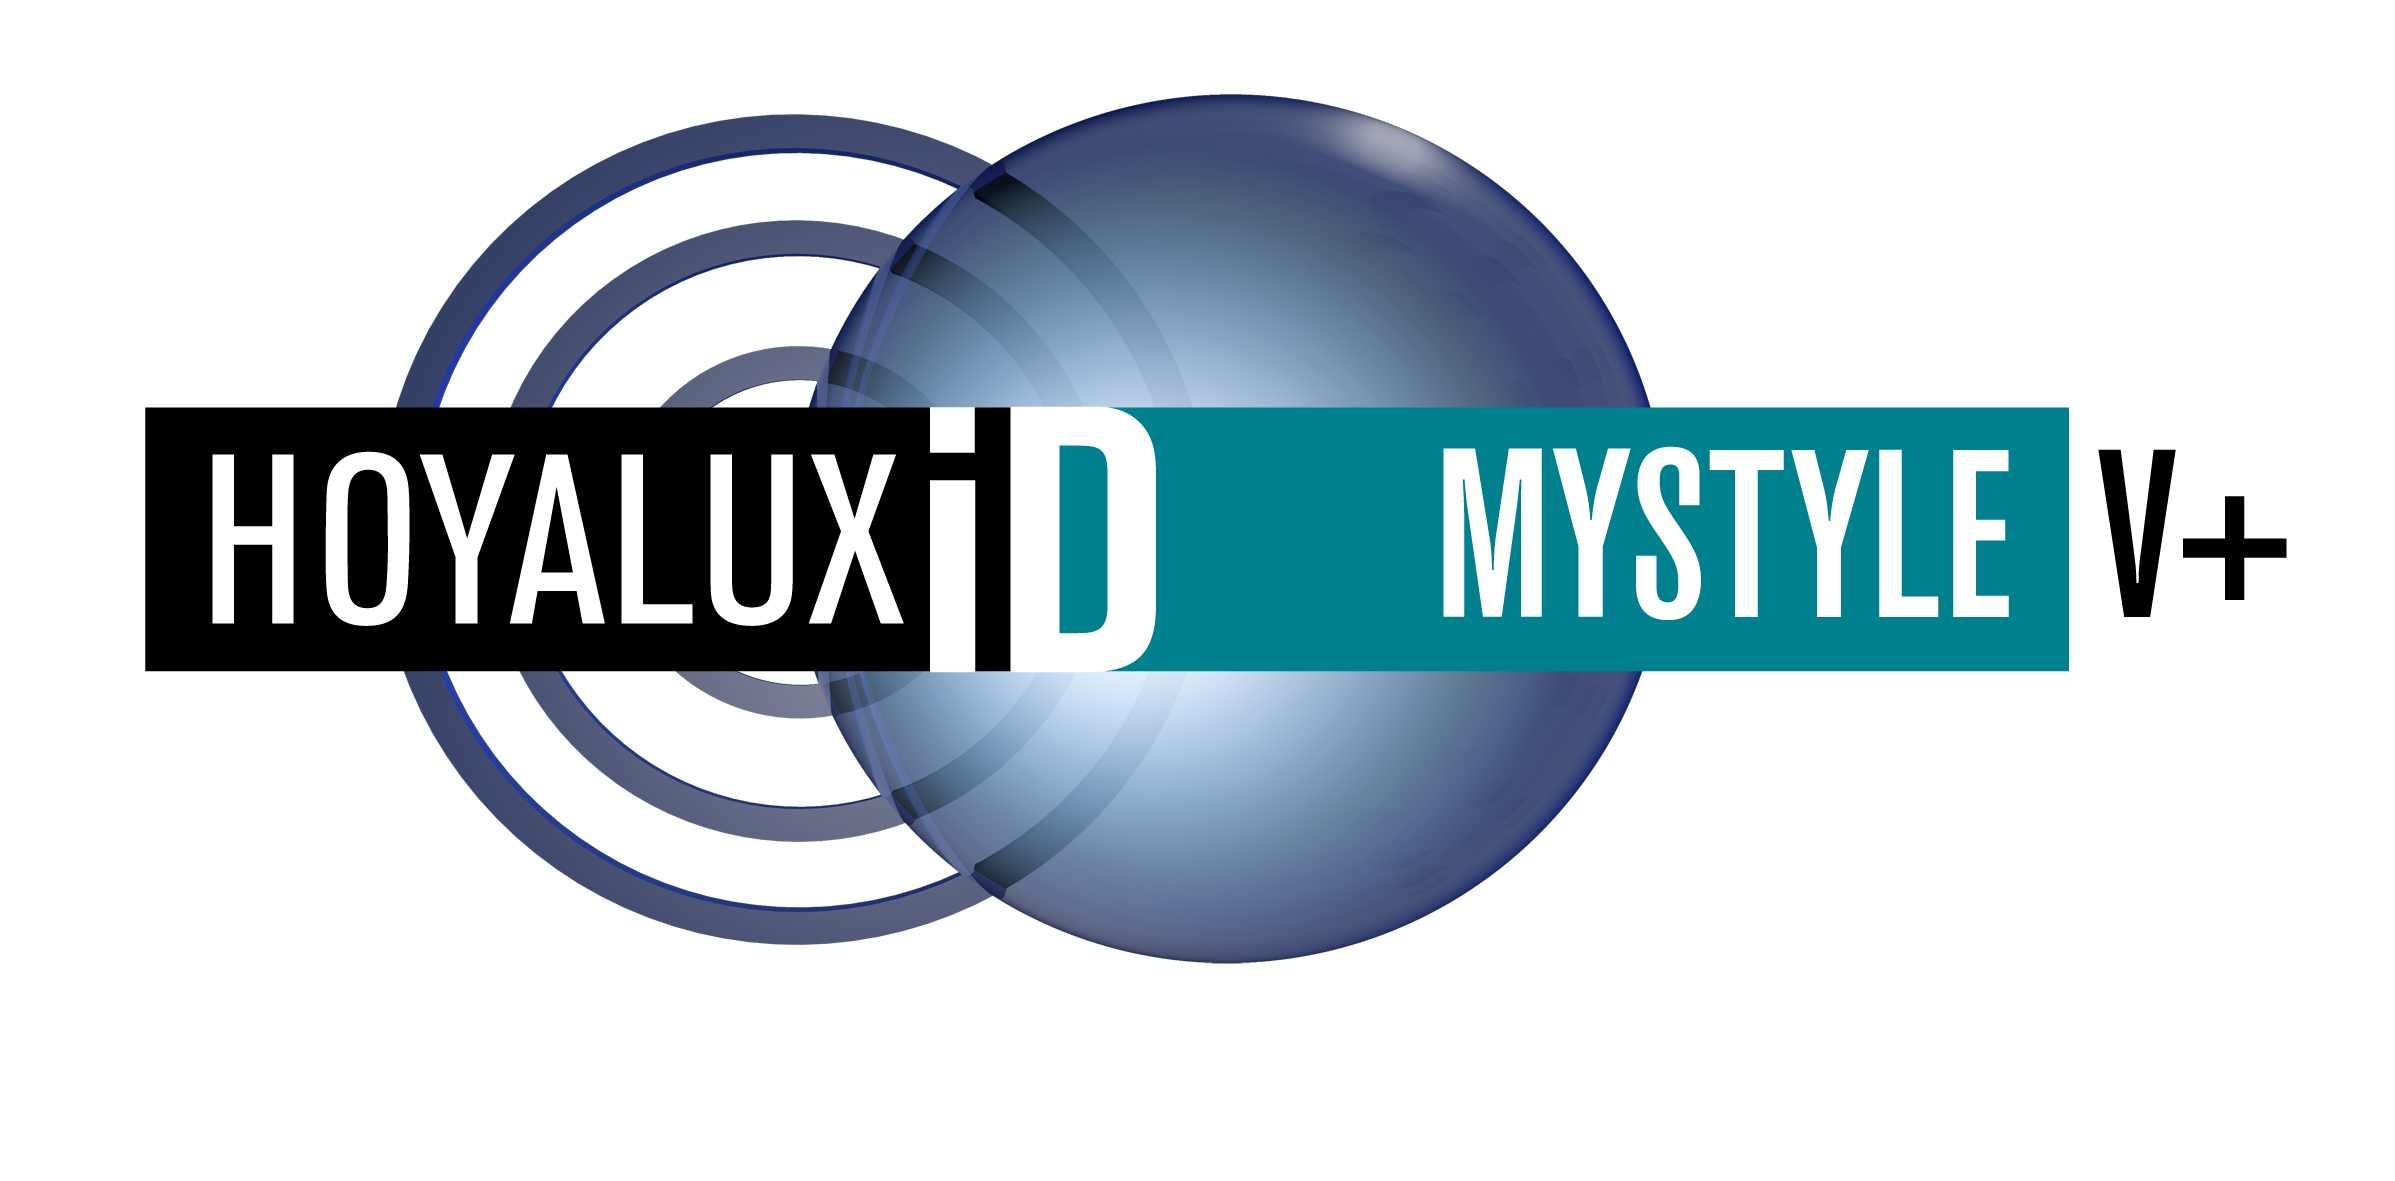 Hoyalux iD MyStyle V+ logo